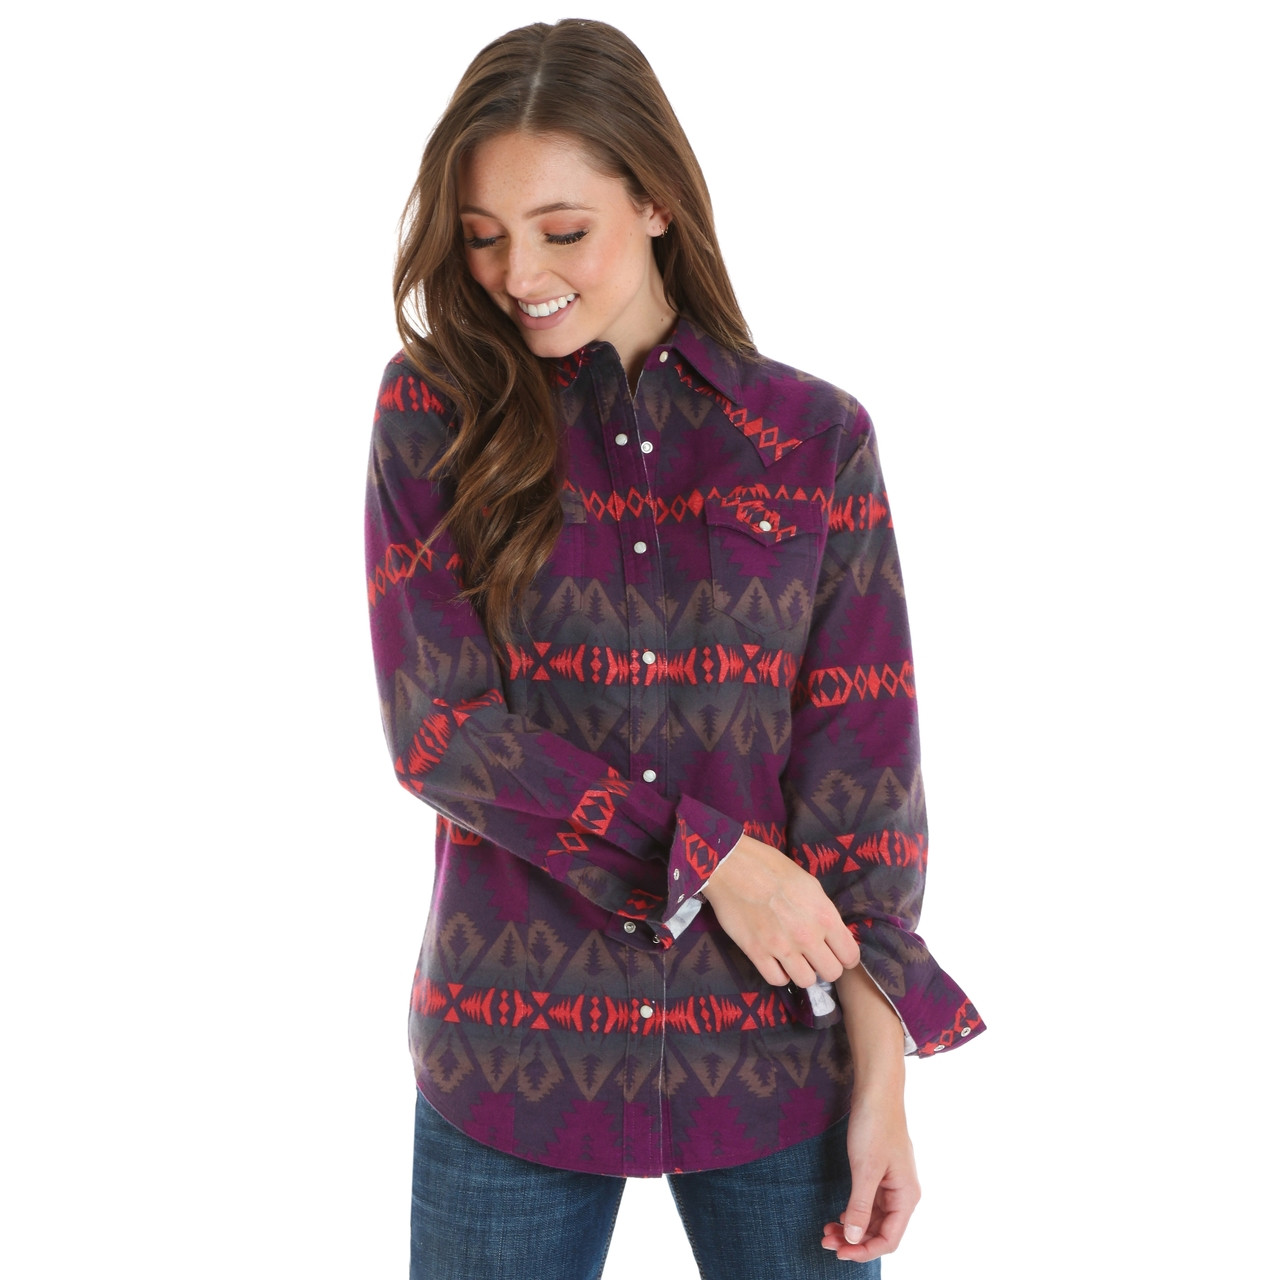 955be2ca Women's Wrangler Plum Purple Checotah Print Shirt - Herbert's Boots ...